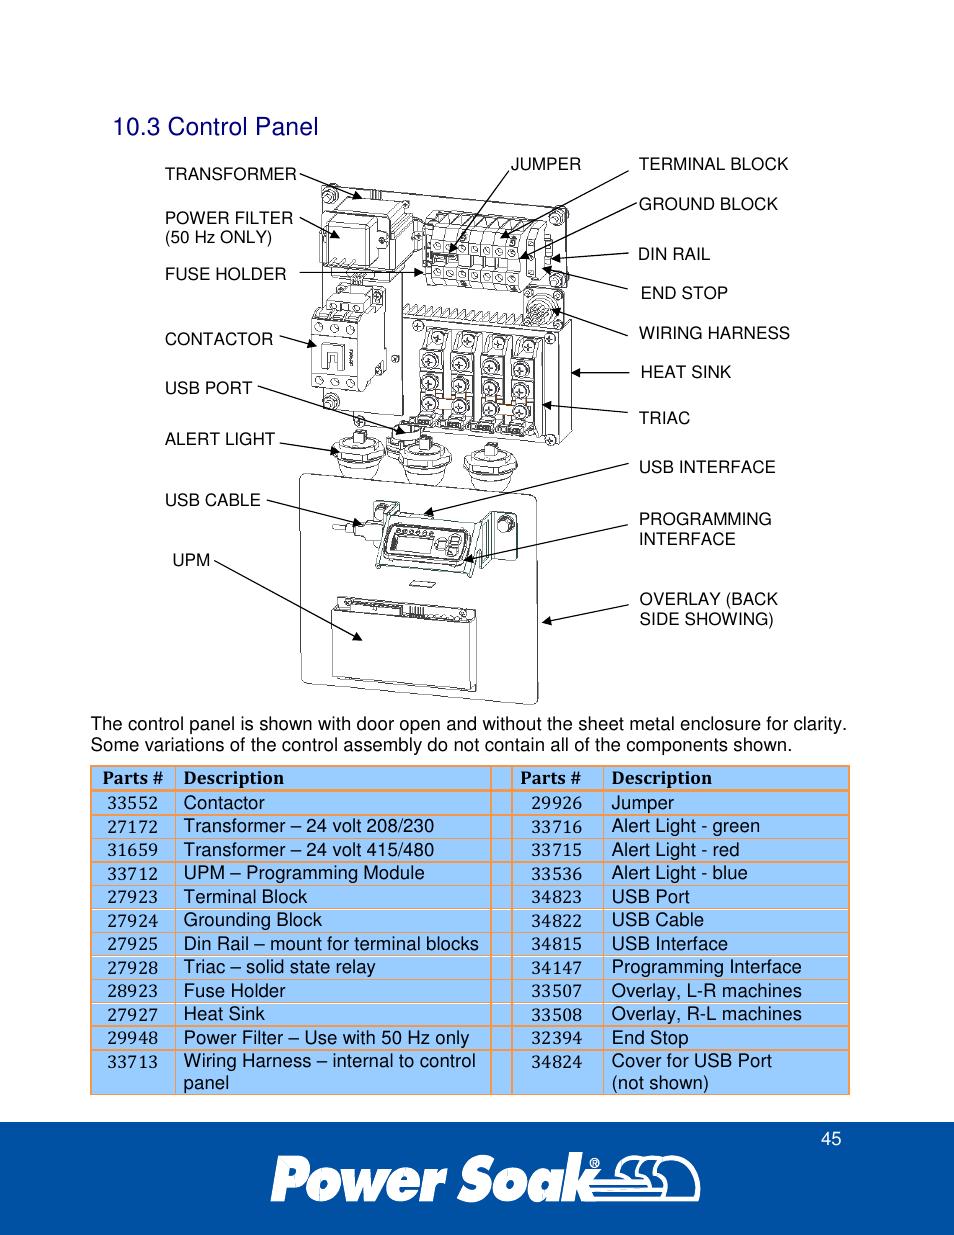 medium resolution of 3 control panel power soak 34774 ps 225 service manual user manual page 51 60